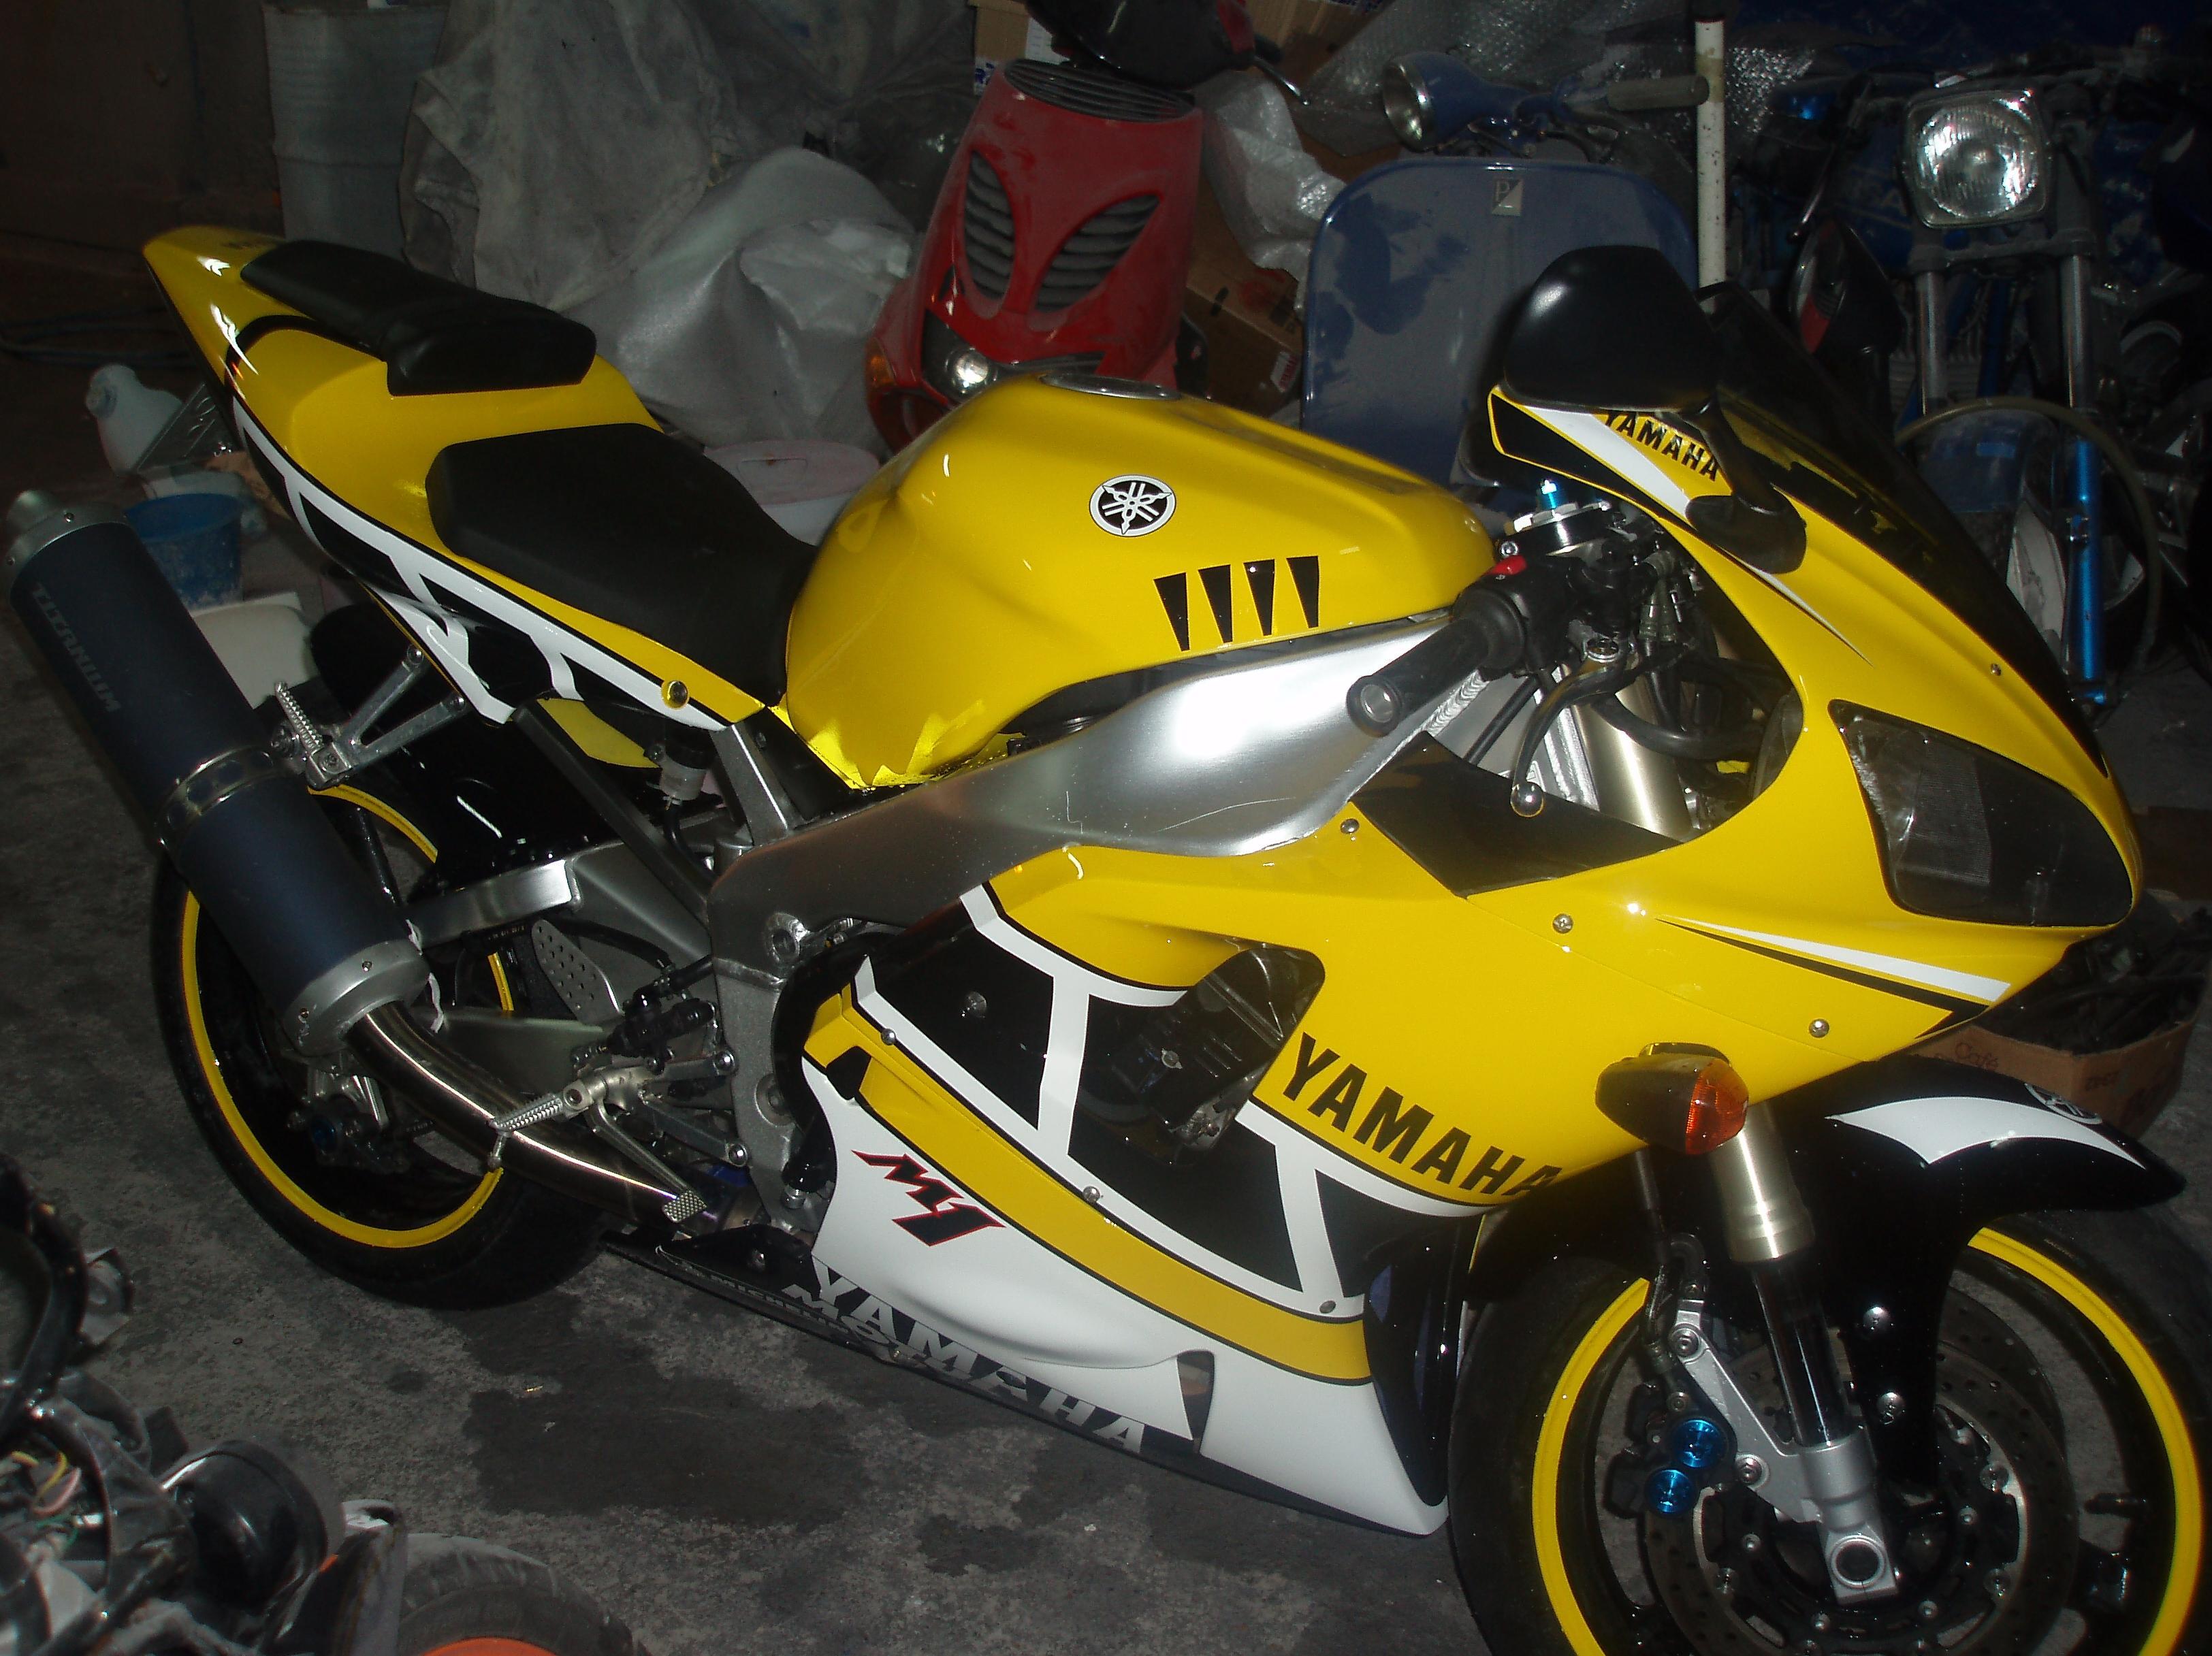 Foto 2 de Motos en Vigo | Moto 2